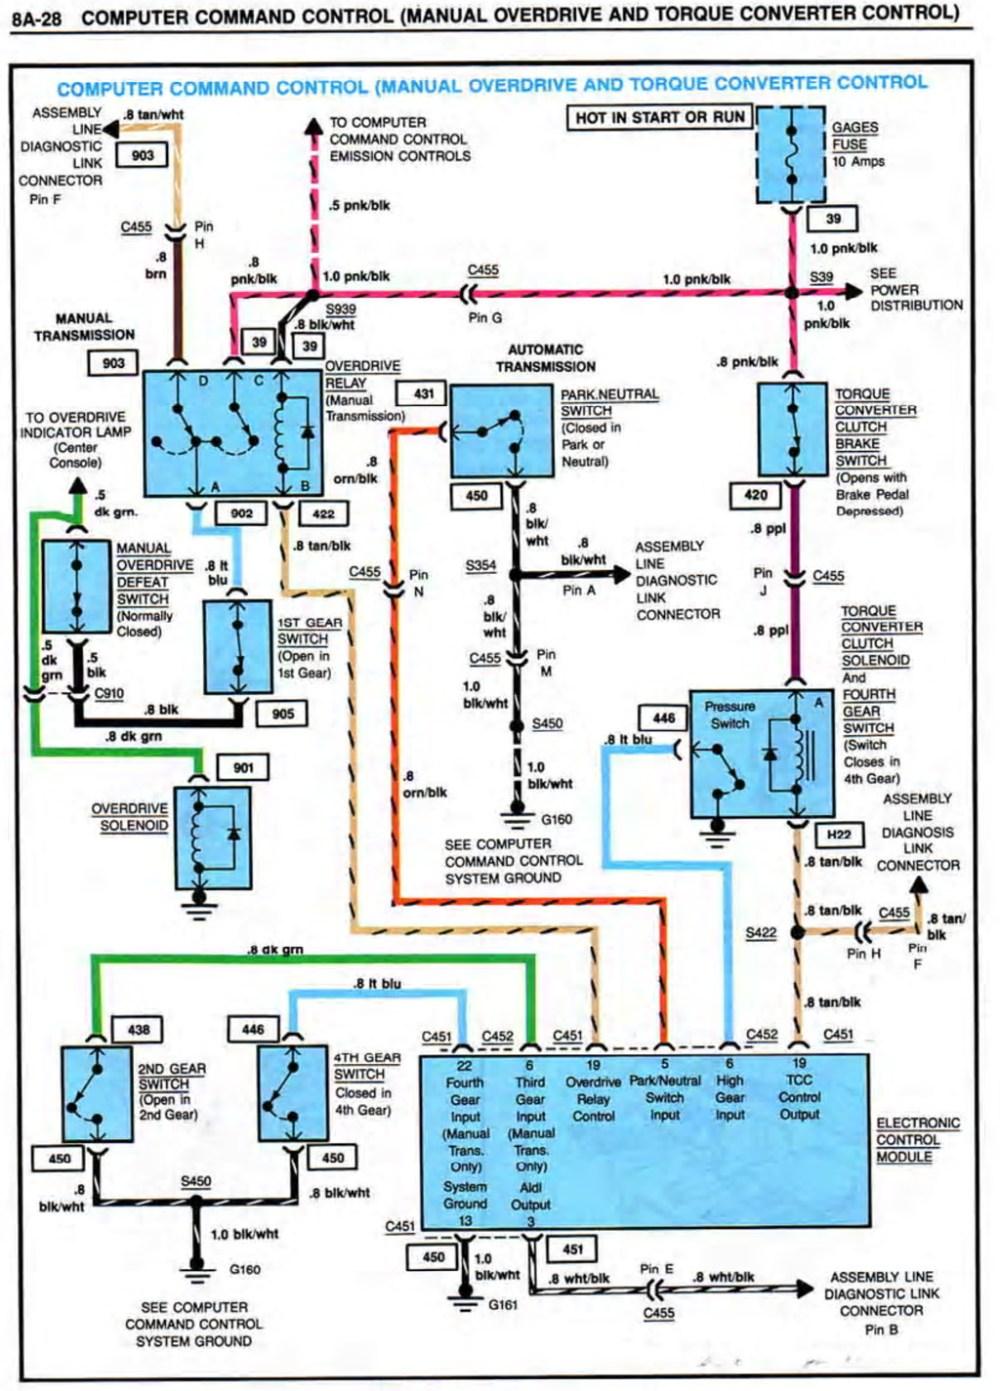 medium resolution of 84 corvette wiring diagram overdrive wiring for an 84 4 3 corvetteforum chevrolet corvetteoriginally posted by ray